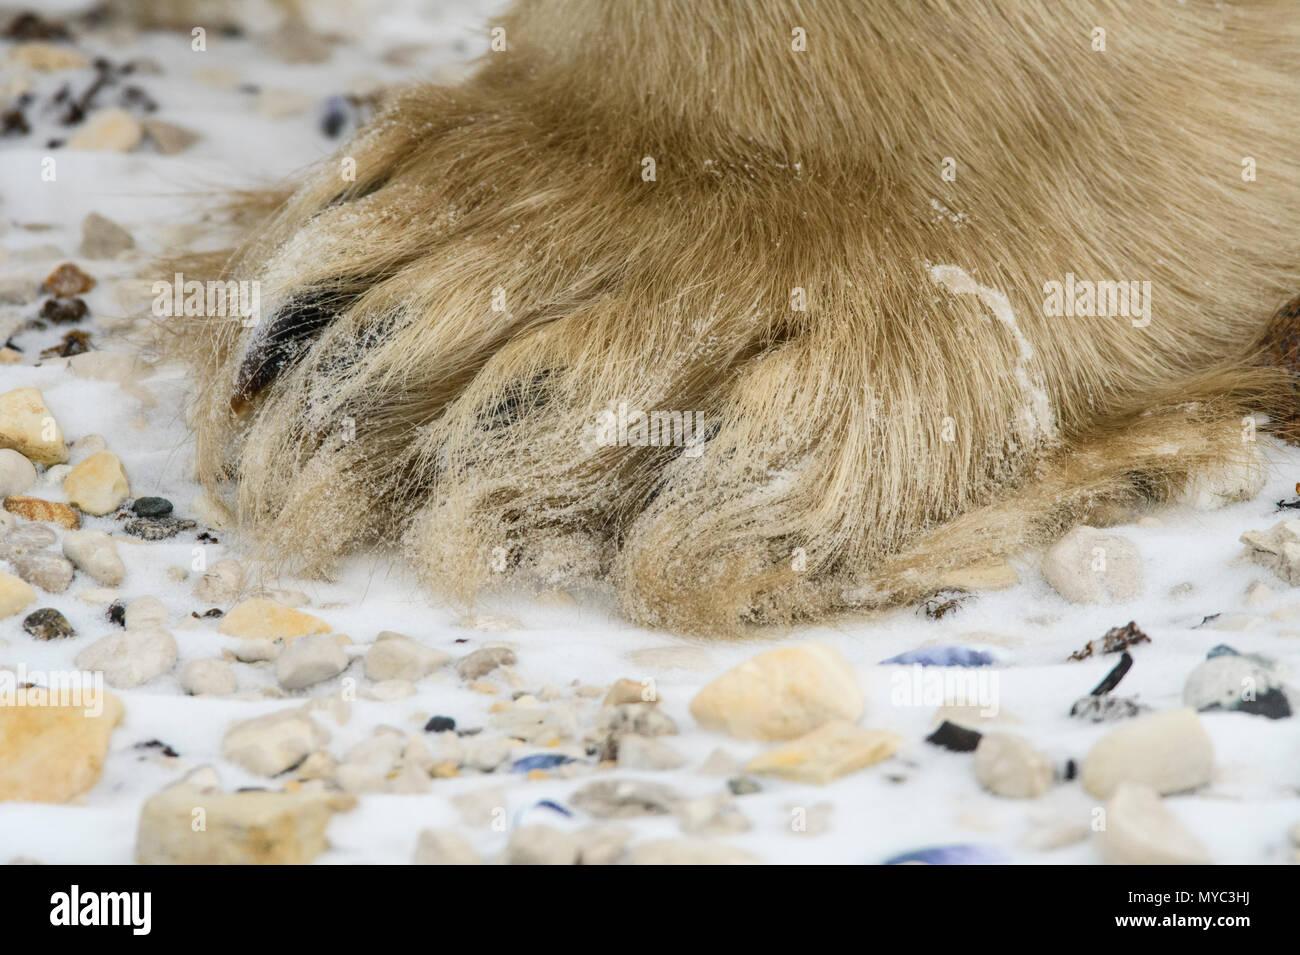 Polar Bear (Ursus maritimus) Legs and paws, Wapusk NP, Cape Churchill, Manitoba, Canada - Stock Image